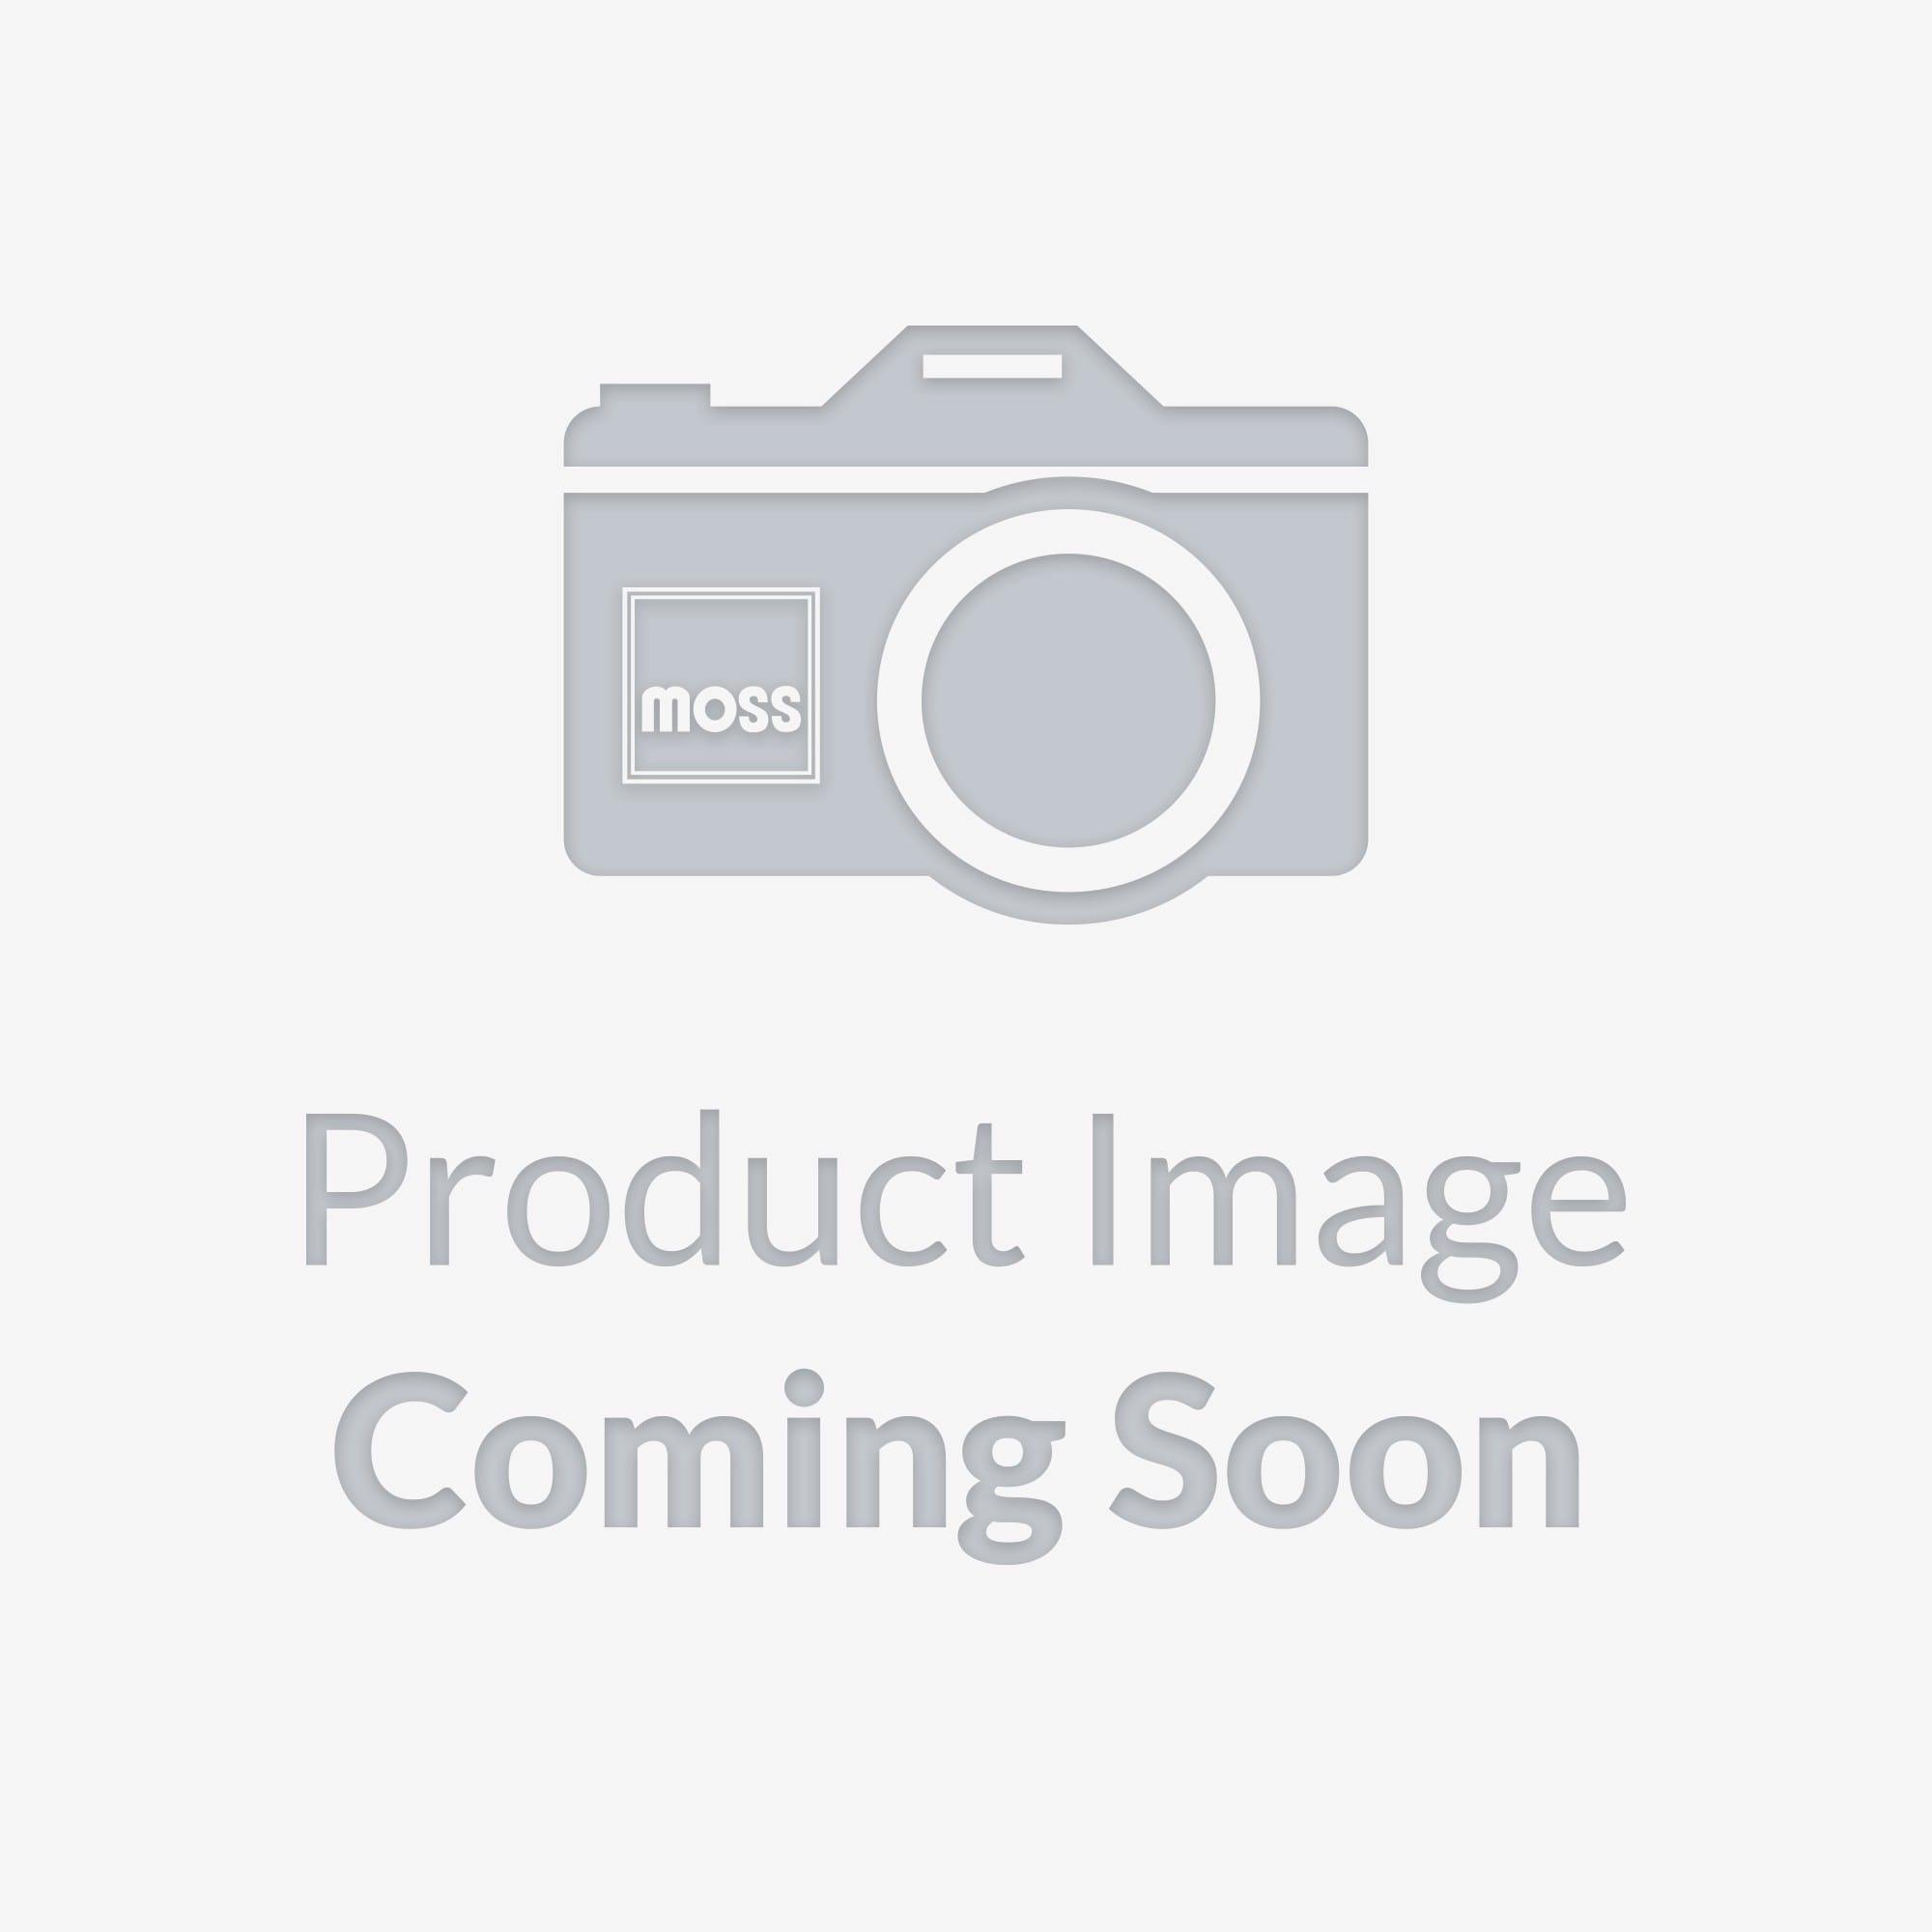 366-380 Mikuni Carburetor Conversion Kit | Moss Motors